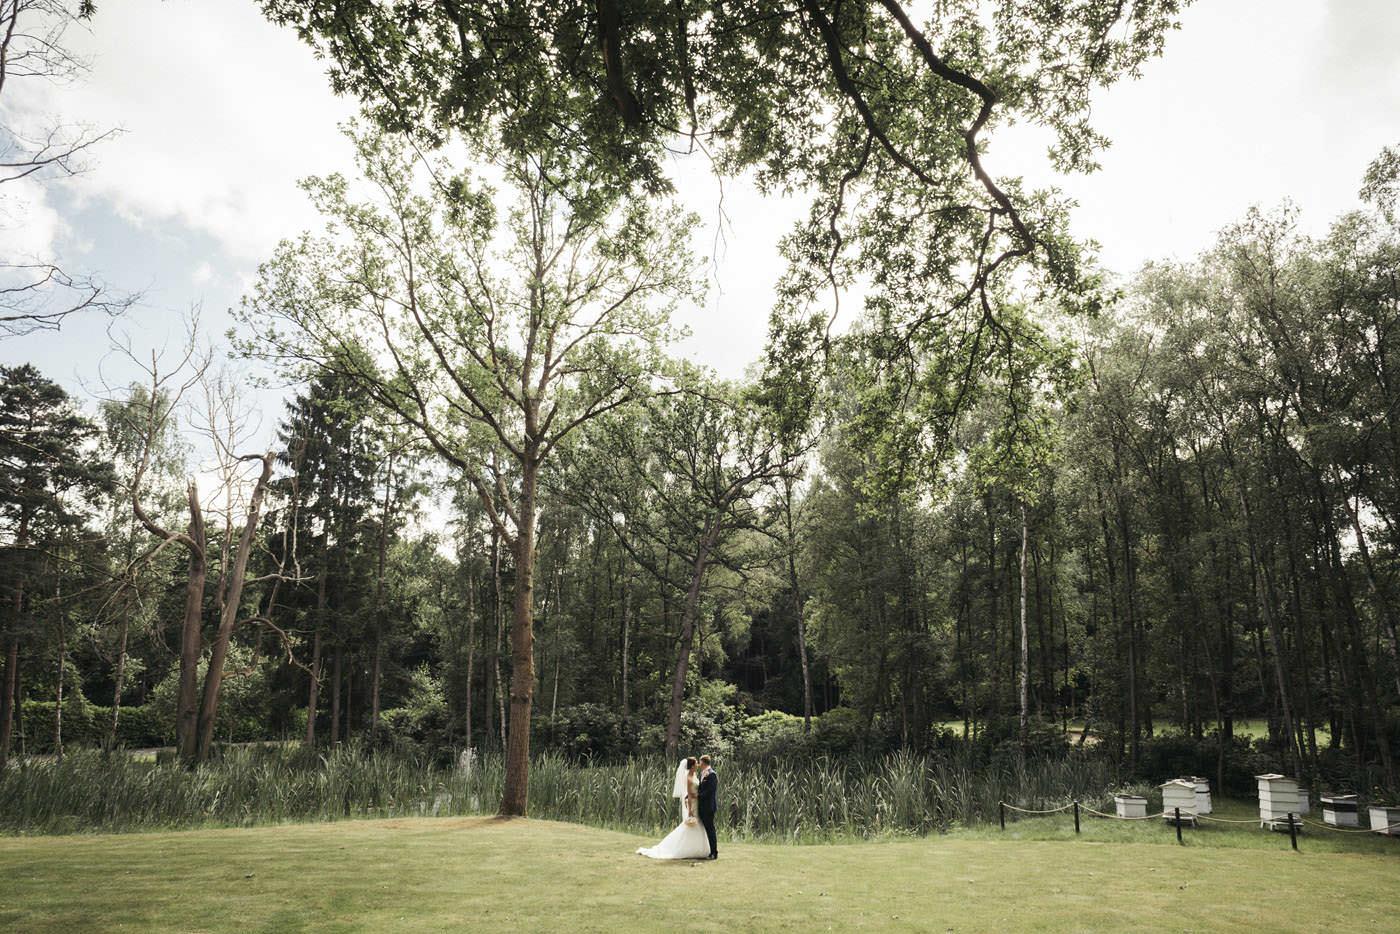 lukeemily foxhills wedding photographer 0080